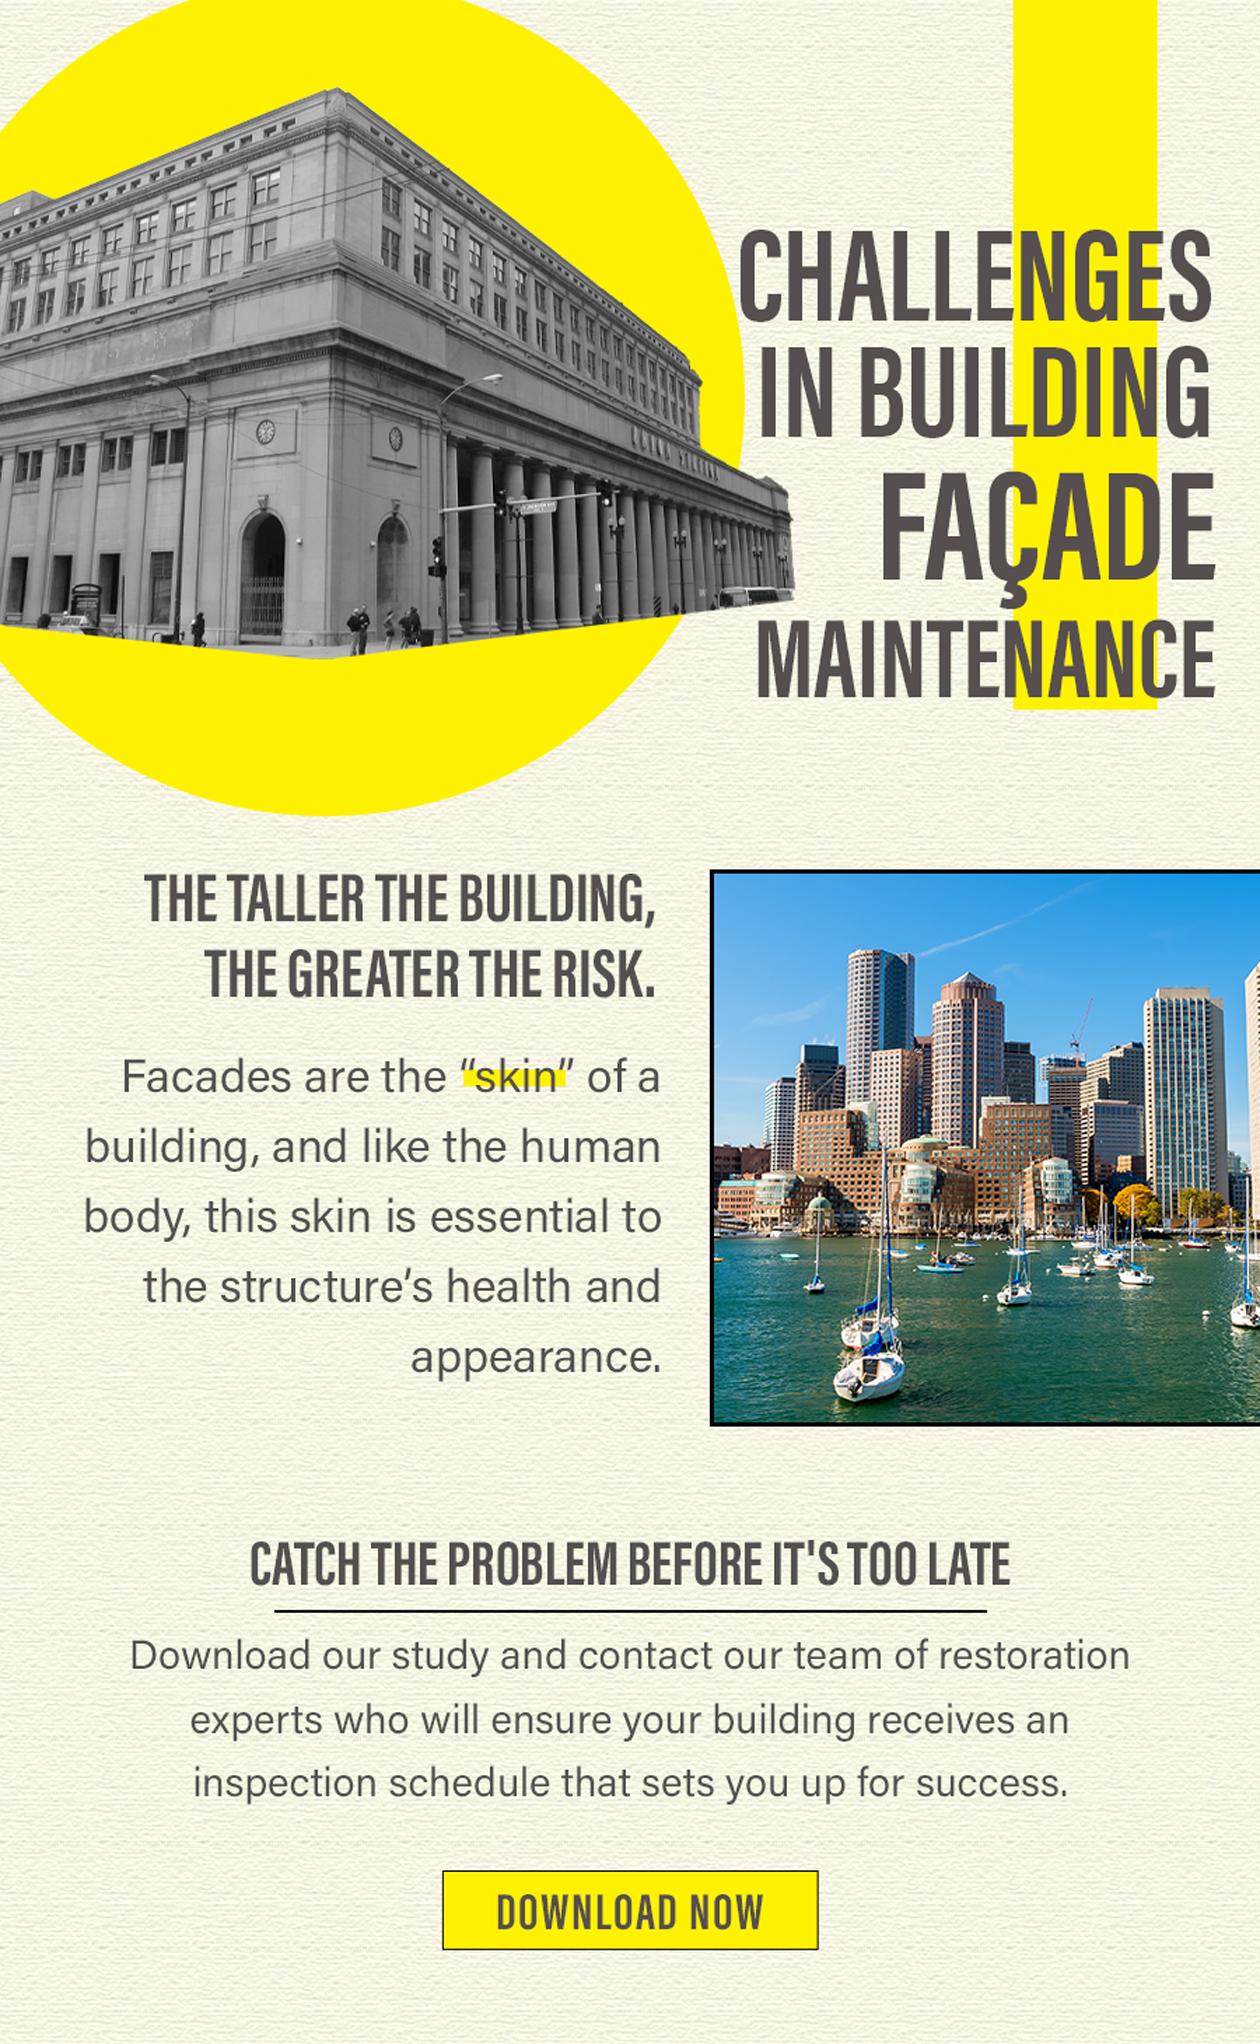 Challenges in Building Facade Maintenance